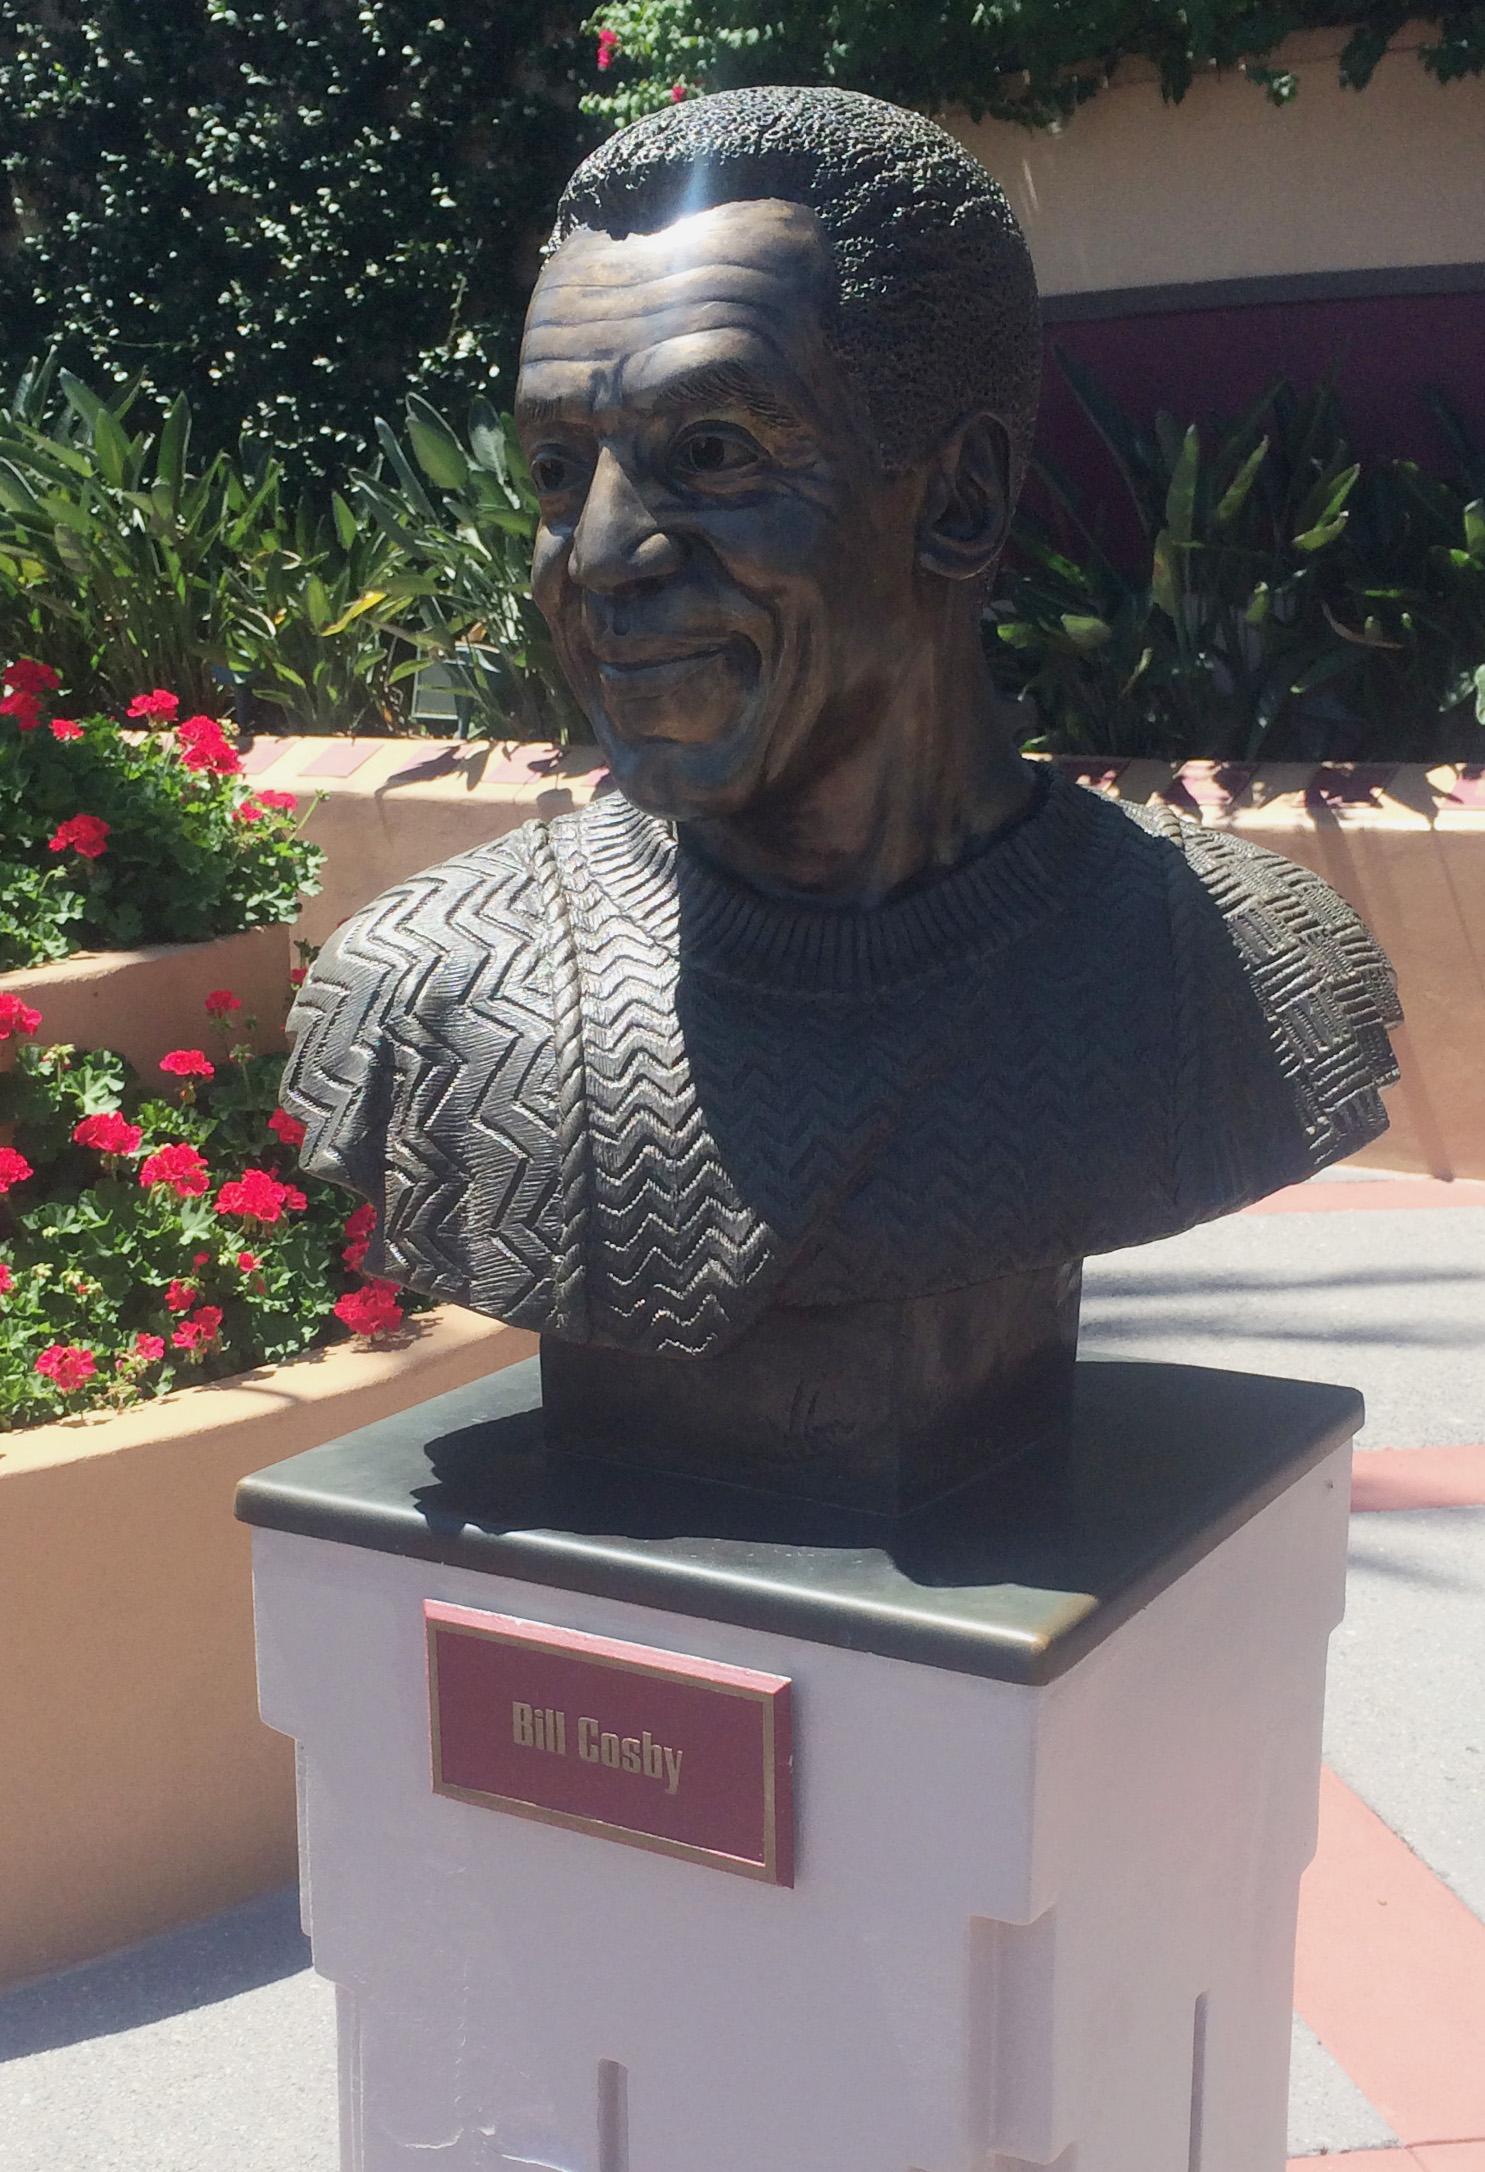 Bill Cosby bust